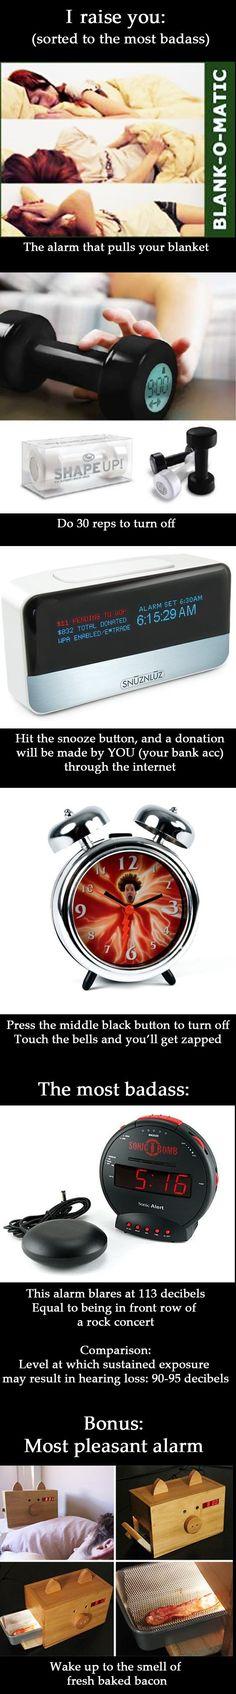 More alarm clocks